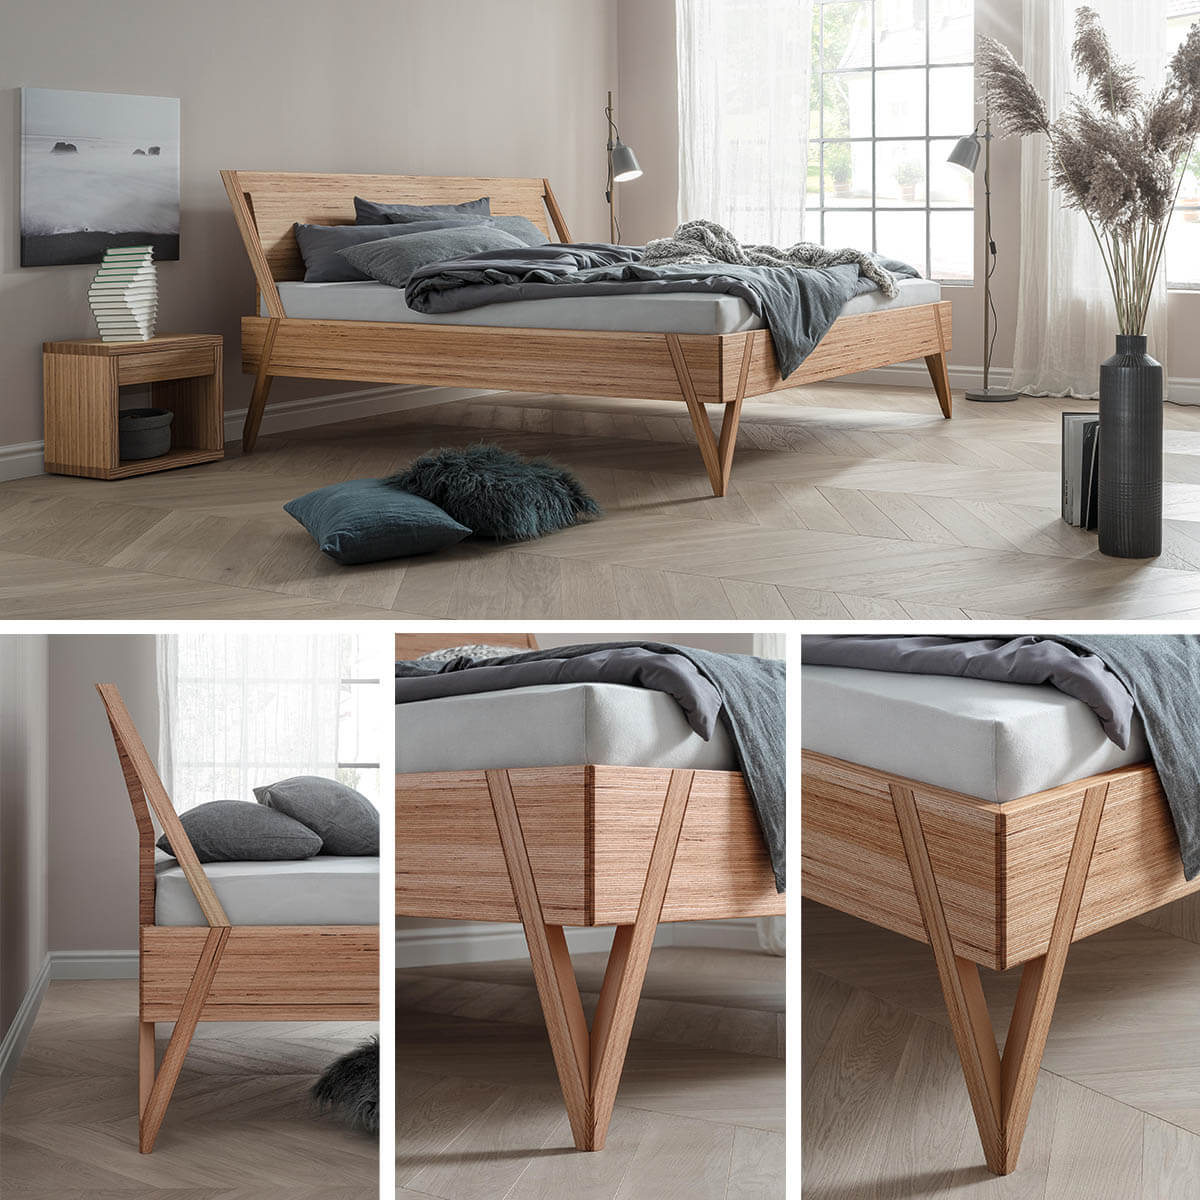 Dormiente-Massivholzbett-Viva-Designbuche-Ambiente